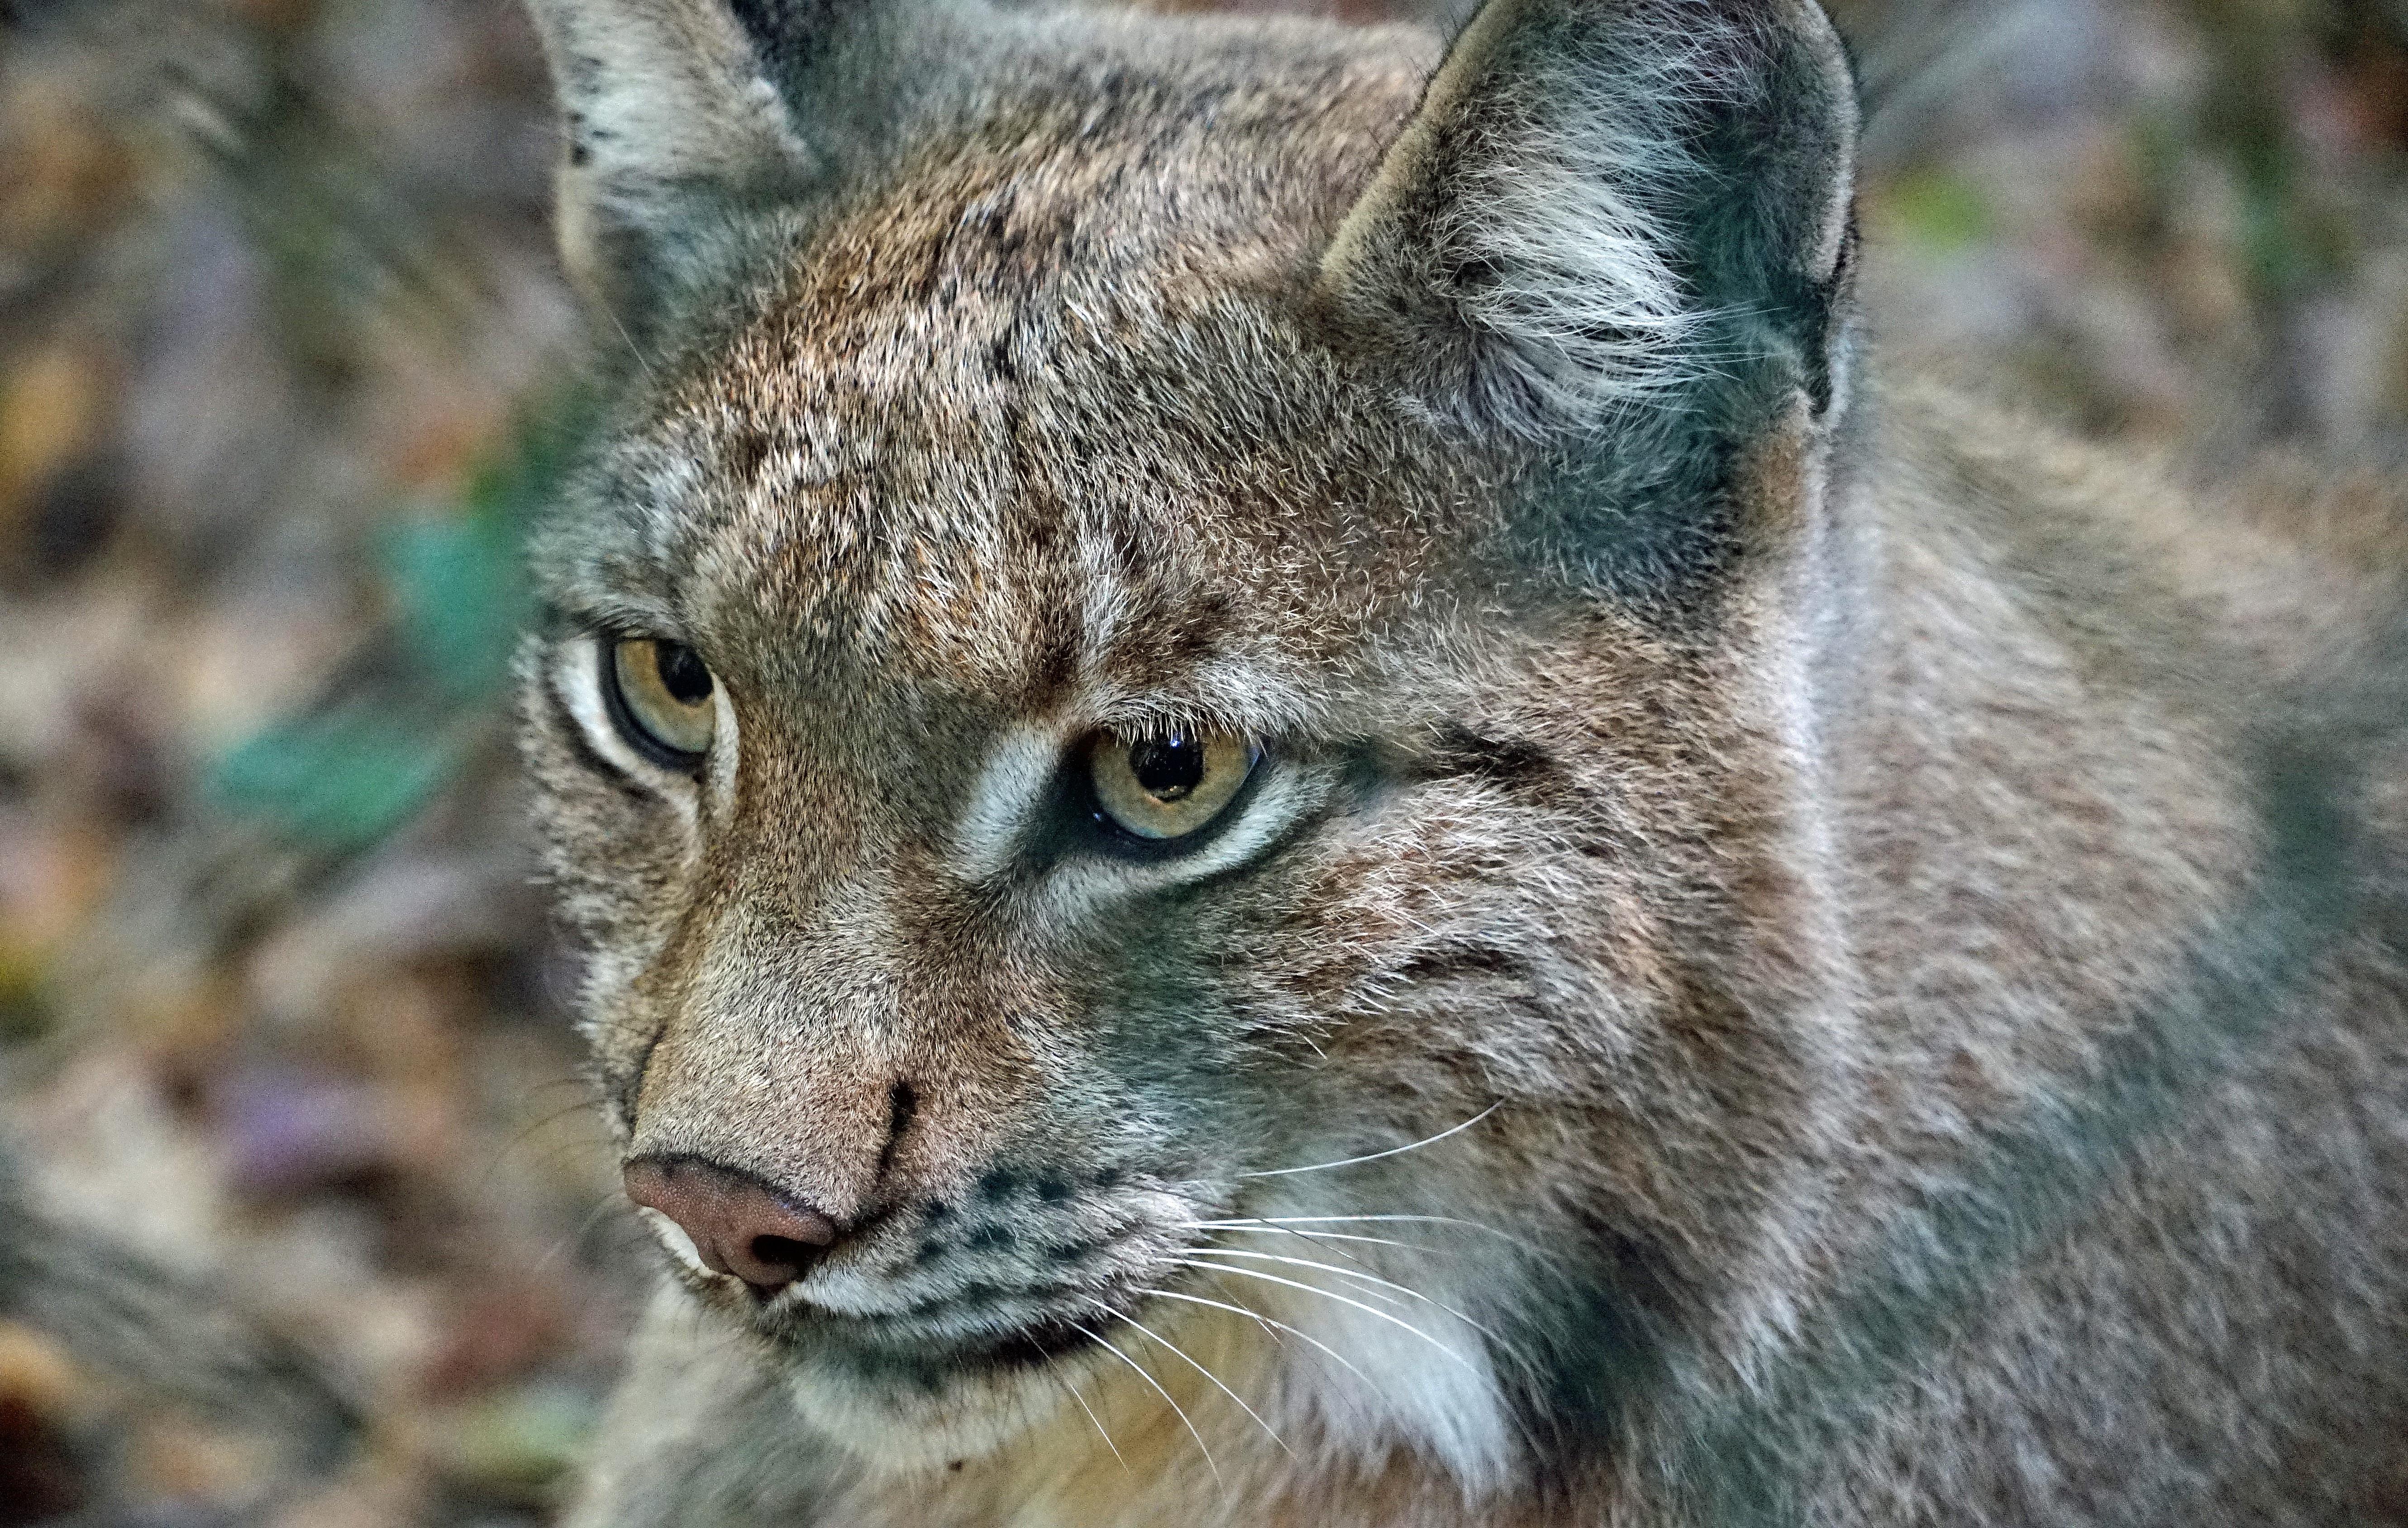 146517 download wallpaper Animals, Iris, Predator, Wild Cat, Wildcat screensavers and pictures for free